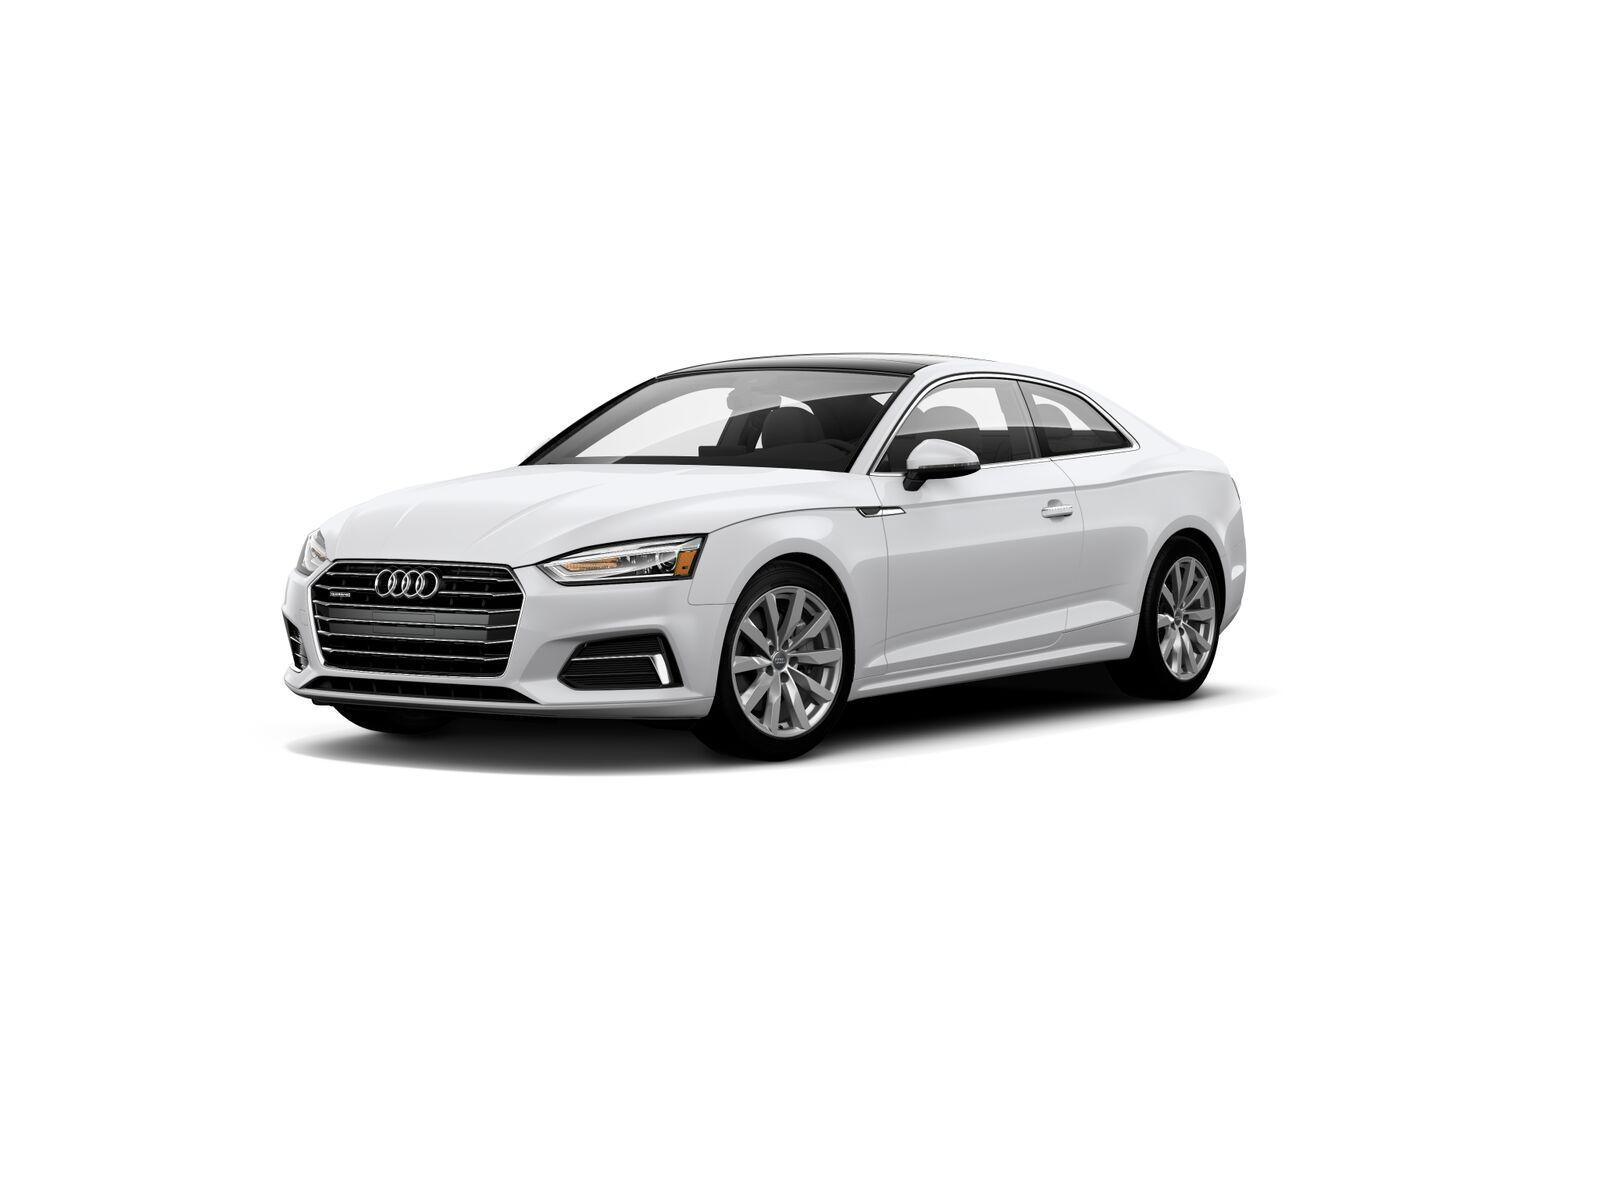 Audi Build Your Own >> Build Your Own Custom Audi A5 Sport Audi Usa Cars Audi A5